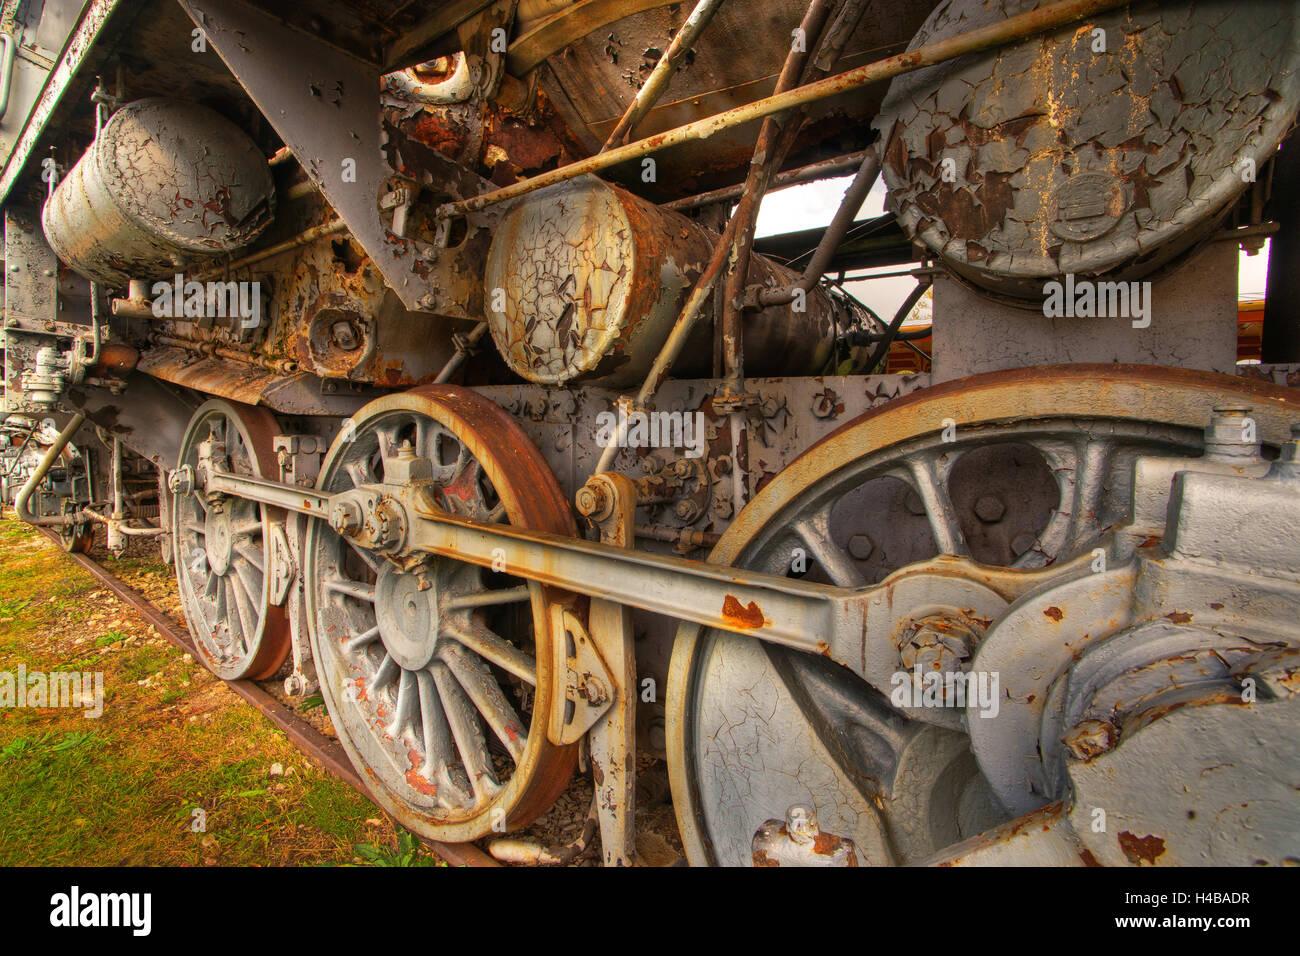 Steam locomotive at the railway station of Haasalu, Estonia - Stock Image